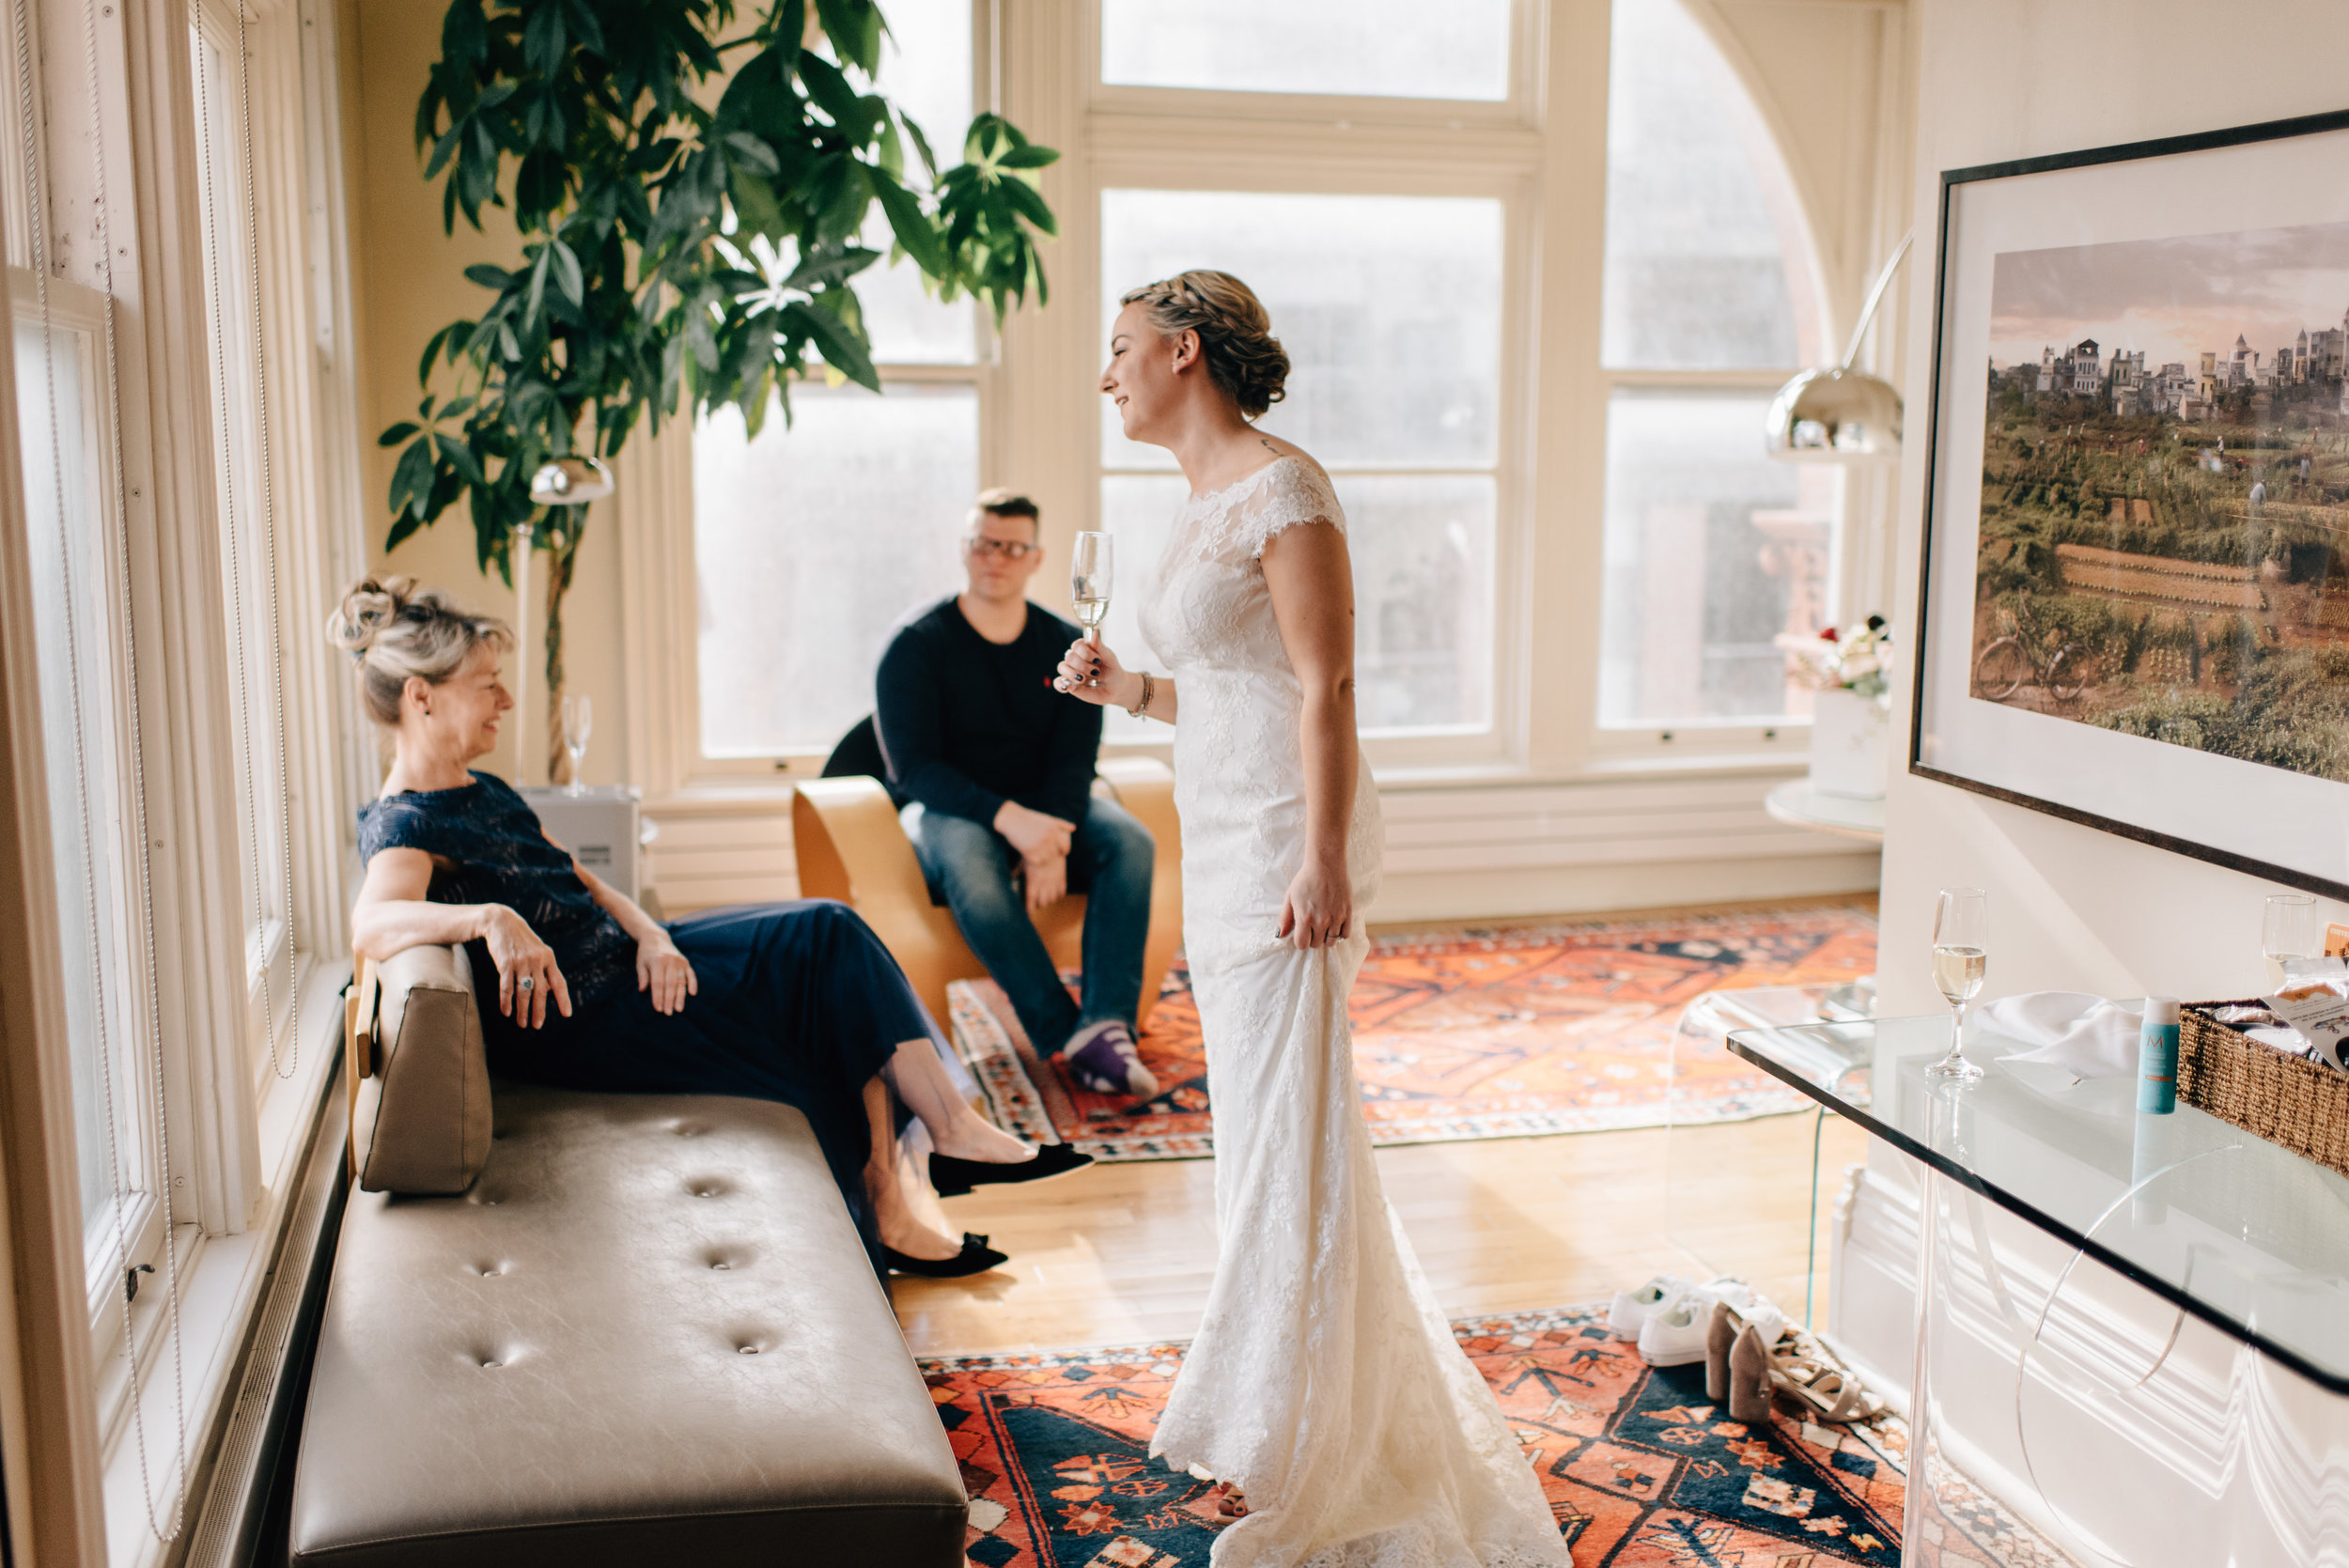 Intimate-Gladstone-Hotel-Wedding-25.jpg